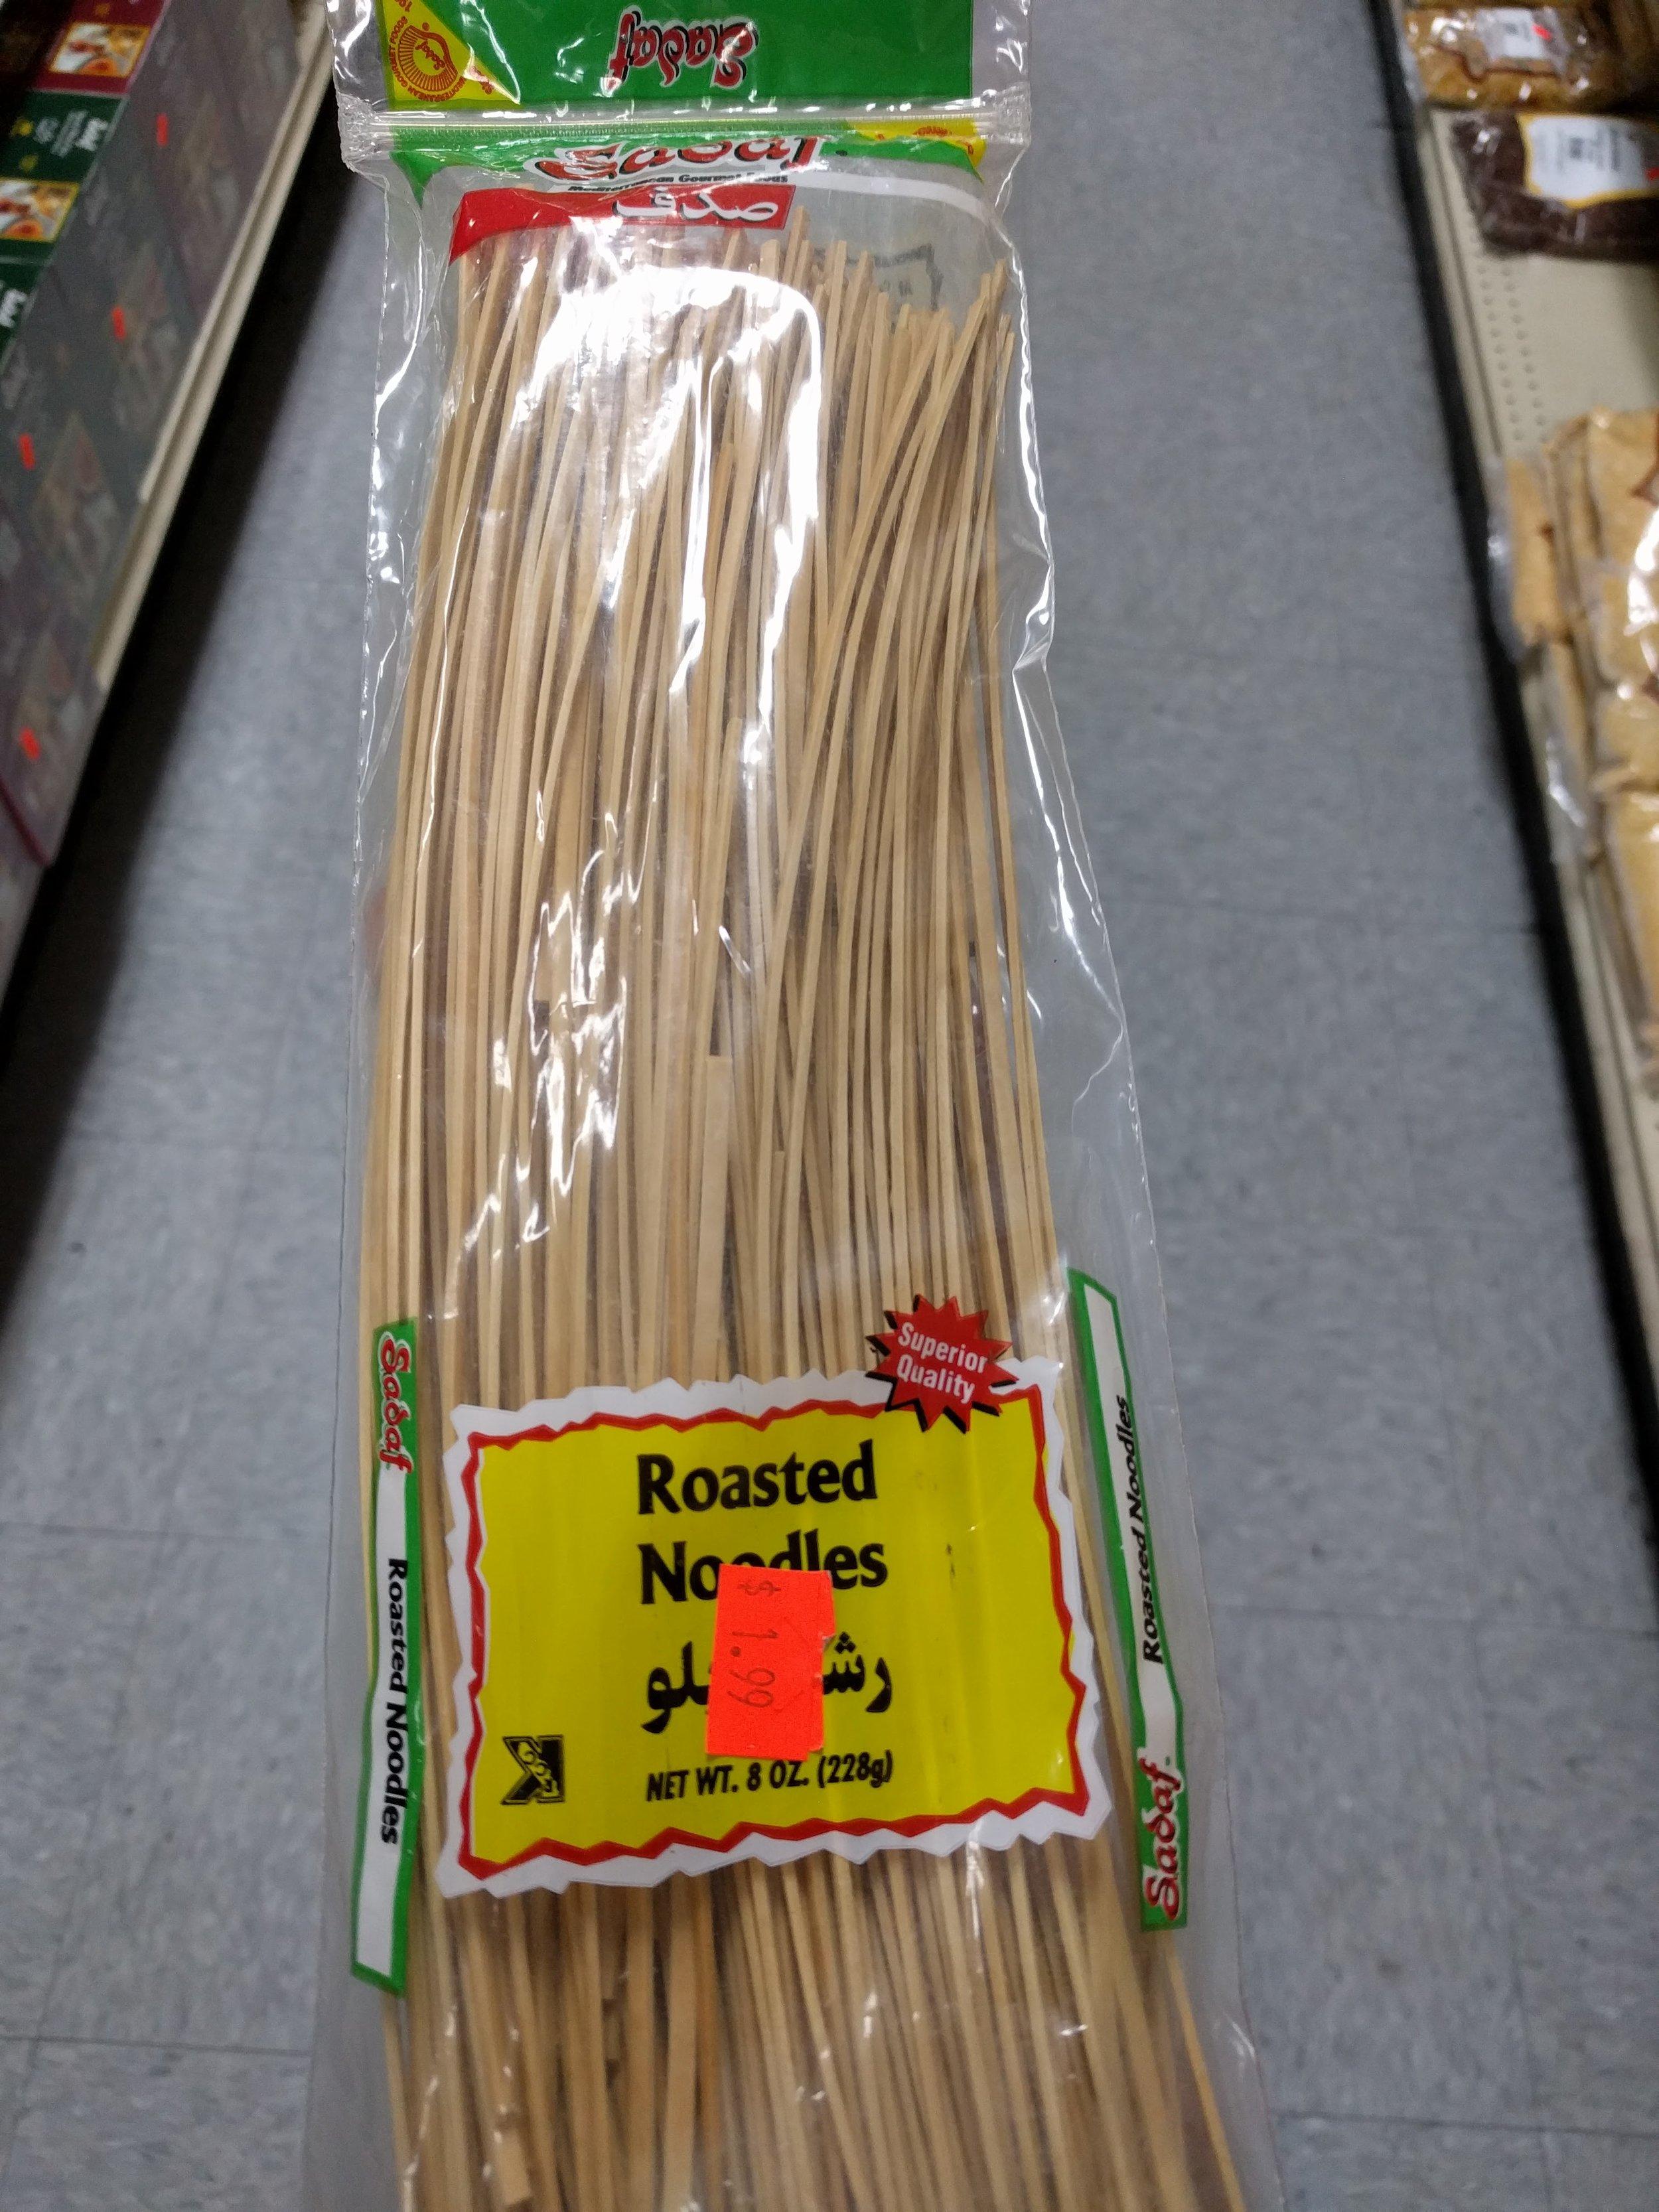 roasted-noodles-Pak-Halal-International-Foods-12259-W-87th-St-Pkwy-Lenexa-KS-66215.jpg